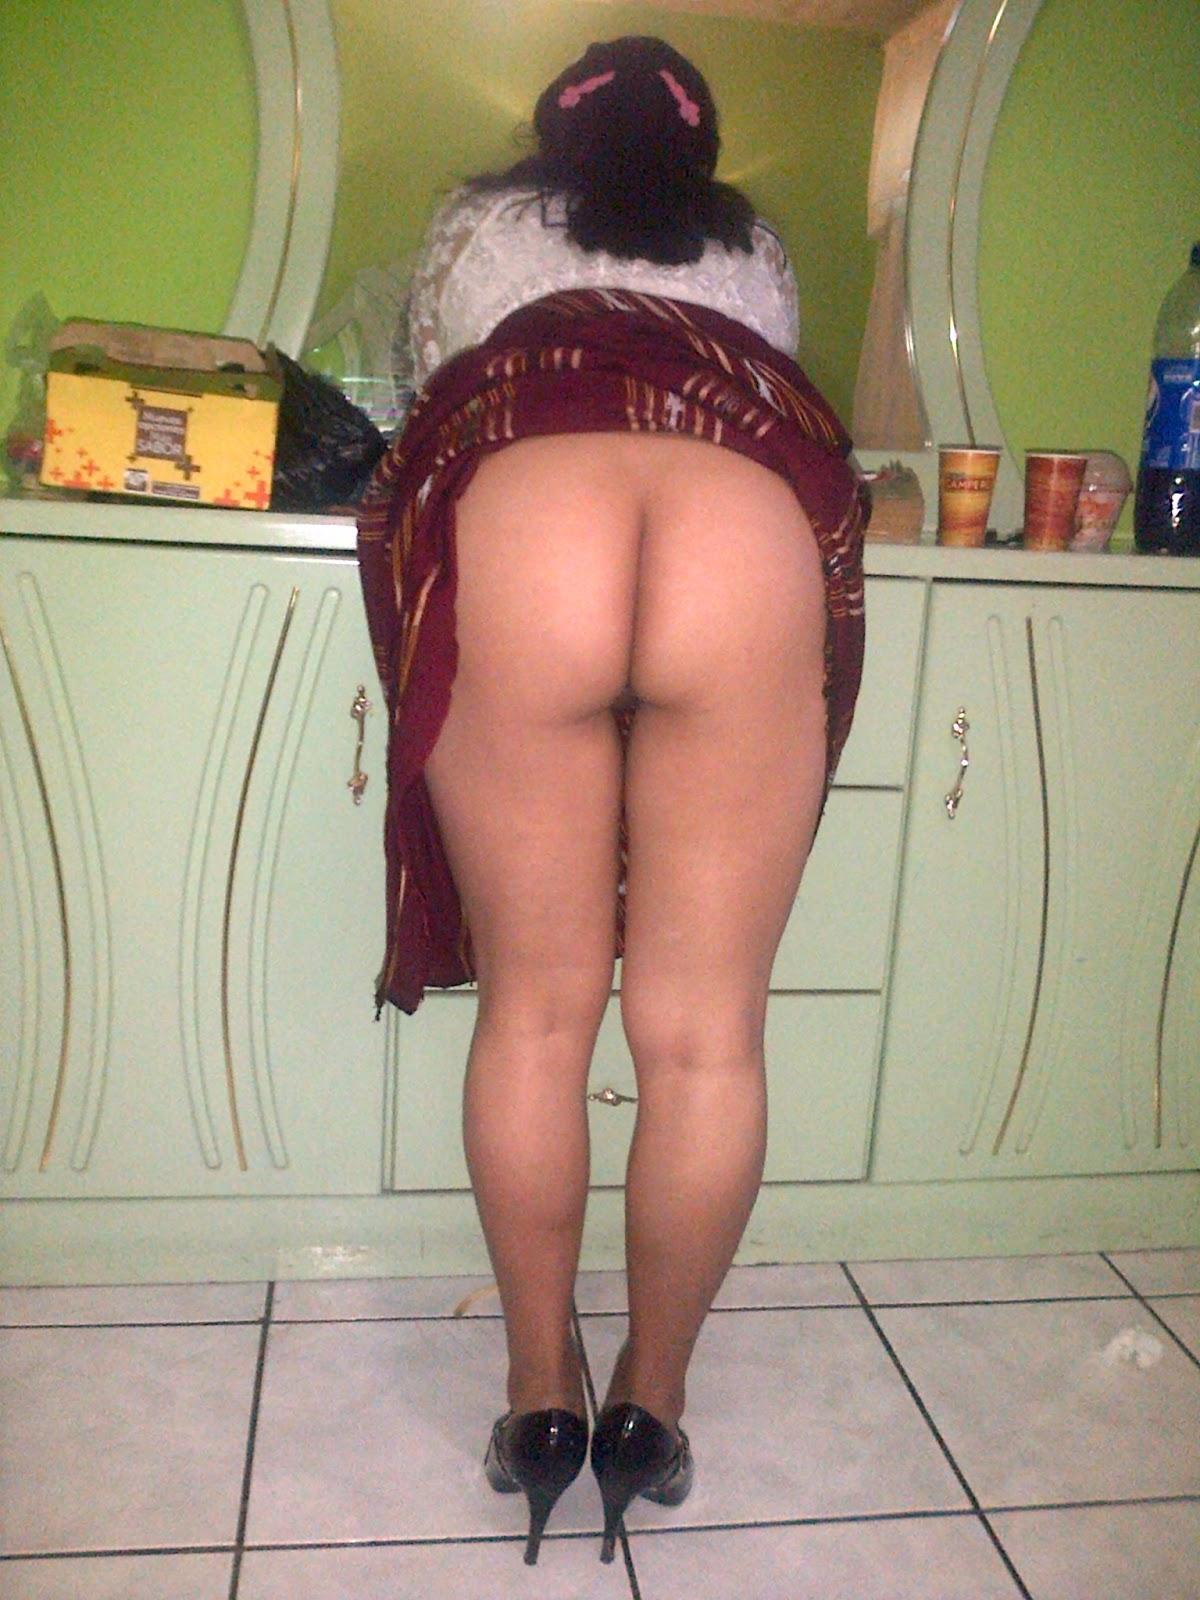 peruanas putas fotos ely escorts